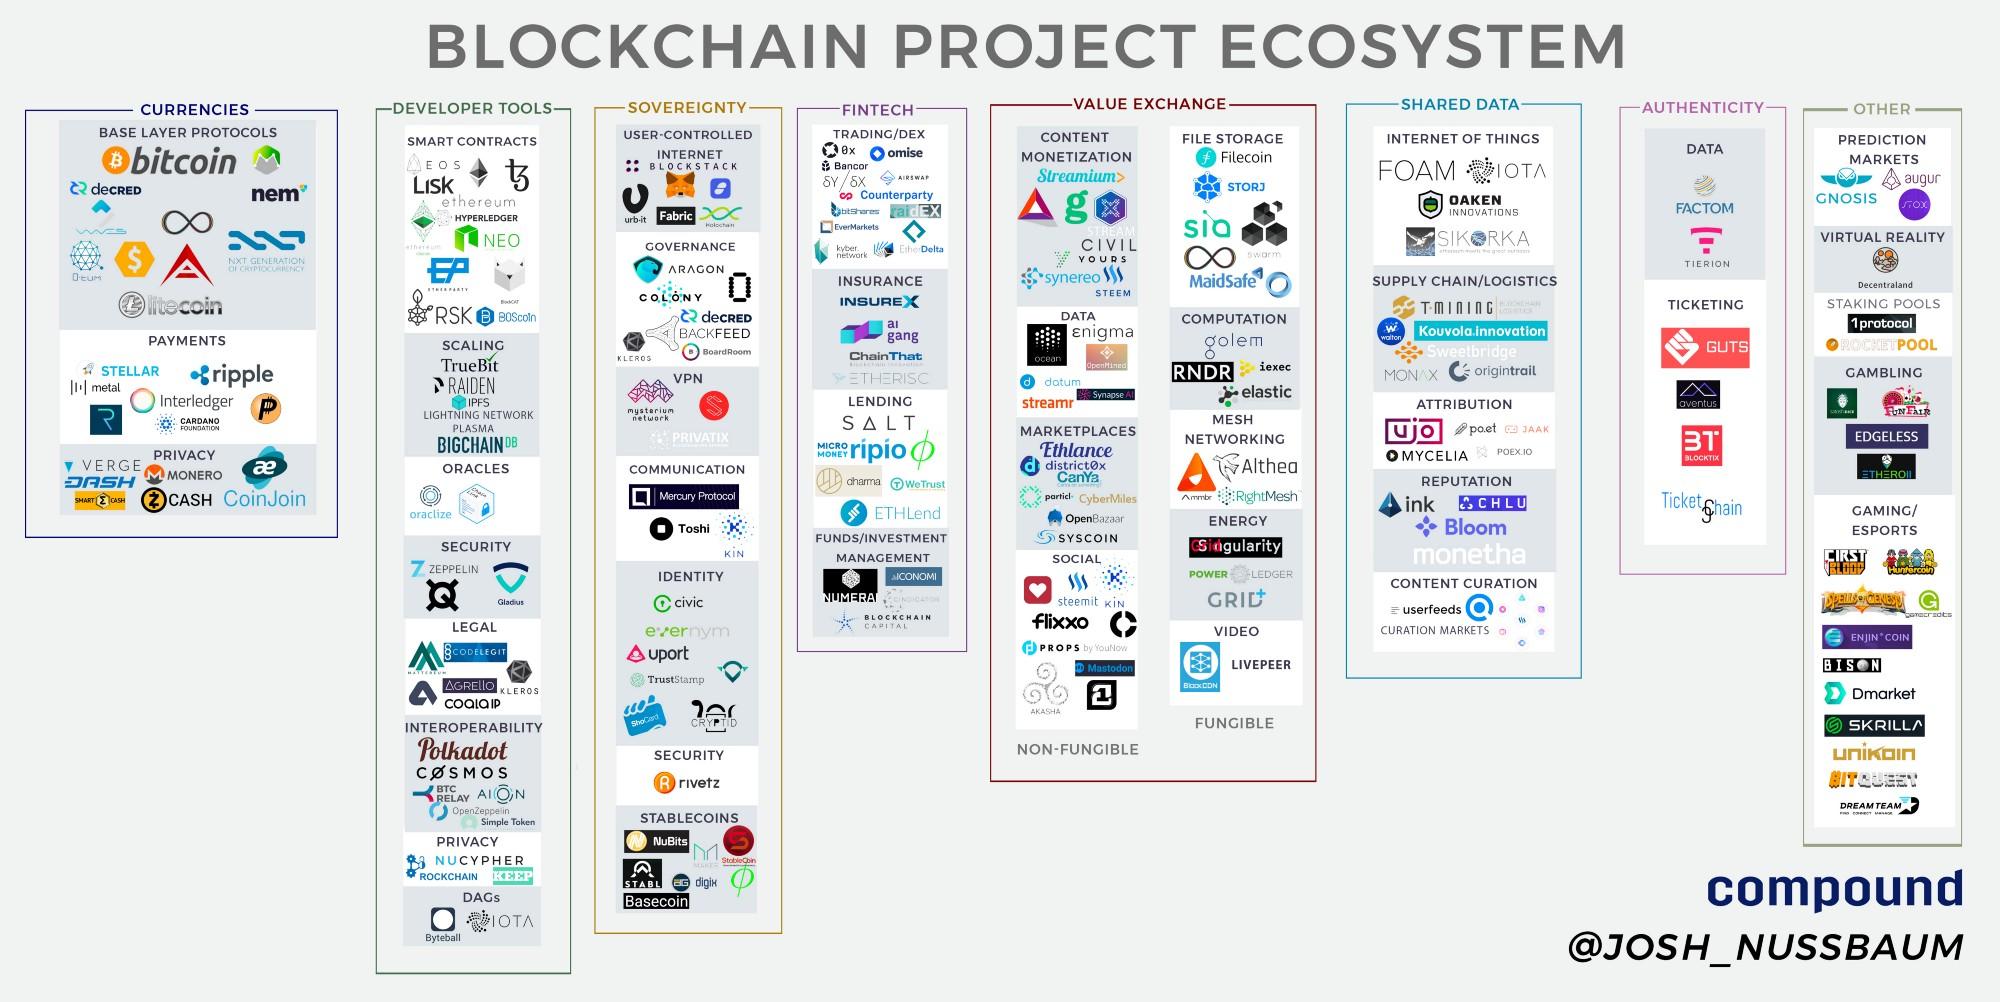 Blockchain Project Ecosystem.jpeg